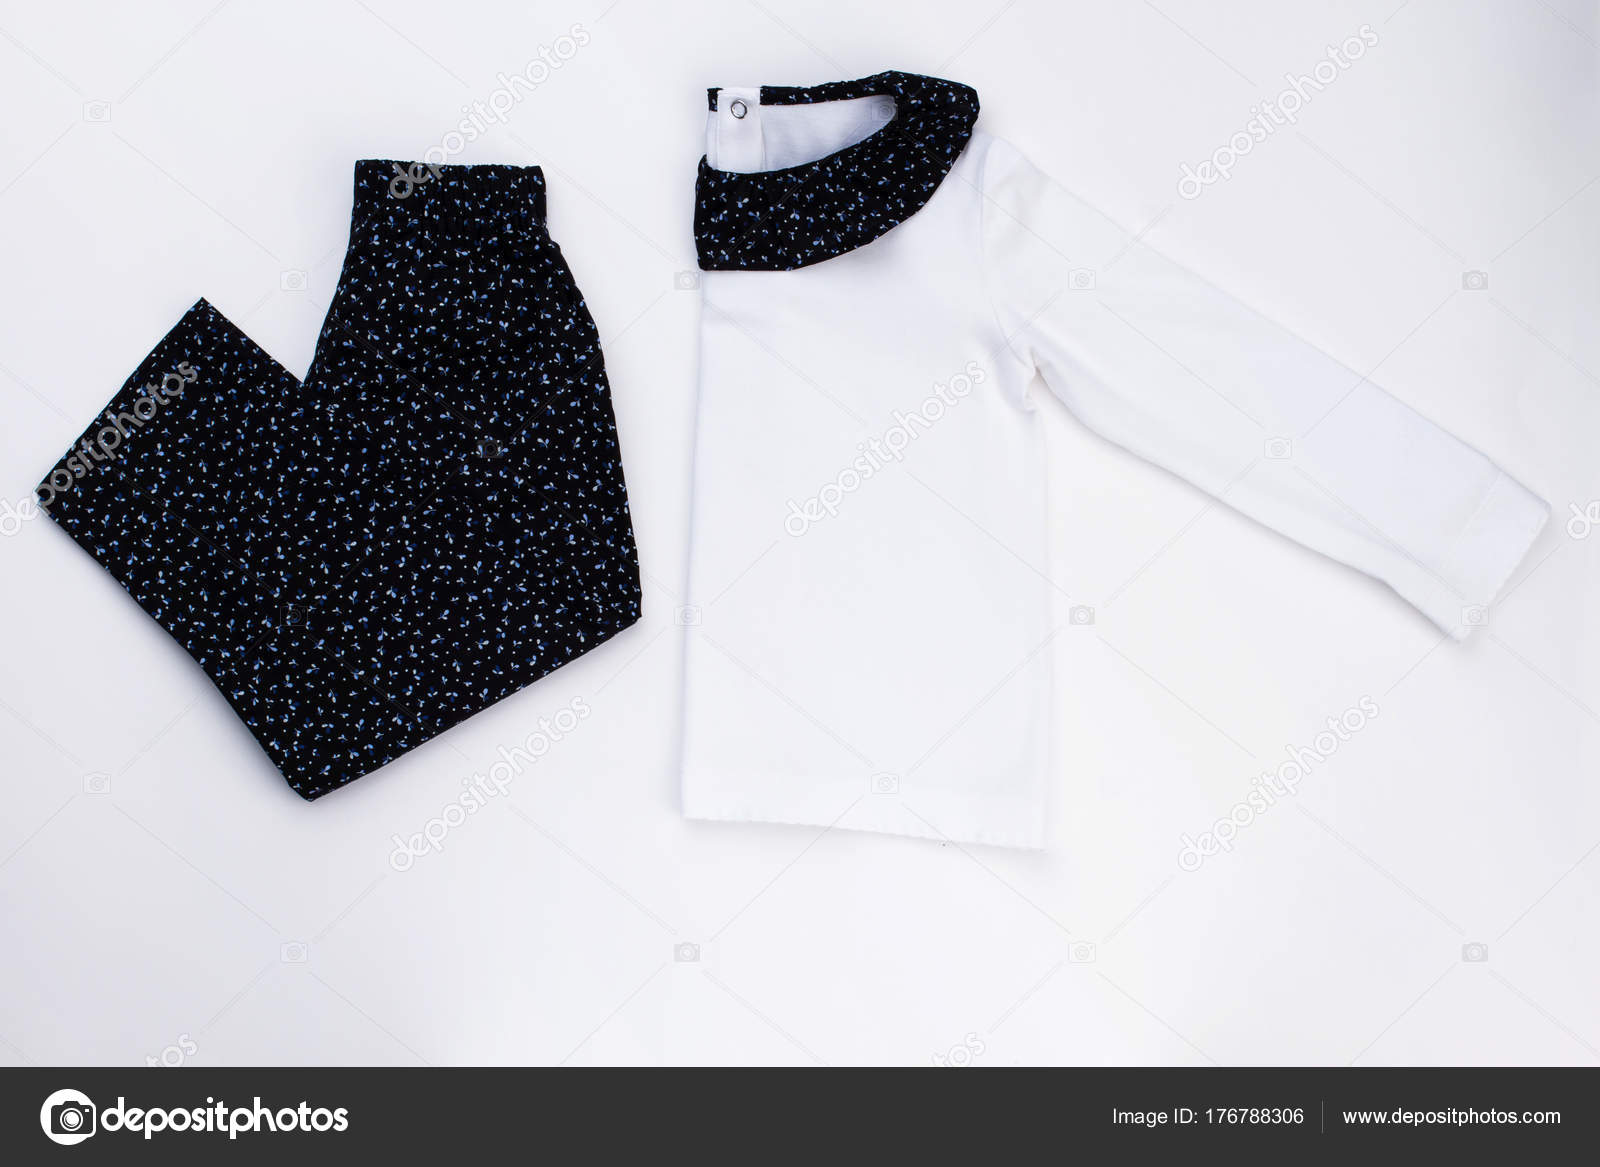 97f352fa6e65 Σετ Ρούχα για μικρά κορίτσια. Μαύρο παντελόνι και λευκό τοπ με λαιμόκοψη.  Νέα συλλογή πιτζάματα για παιδιά — Εικόνα από ...